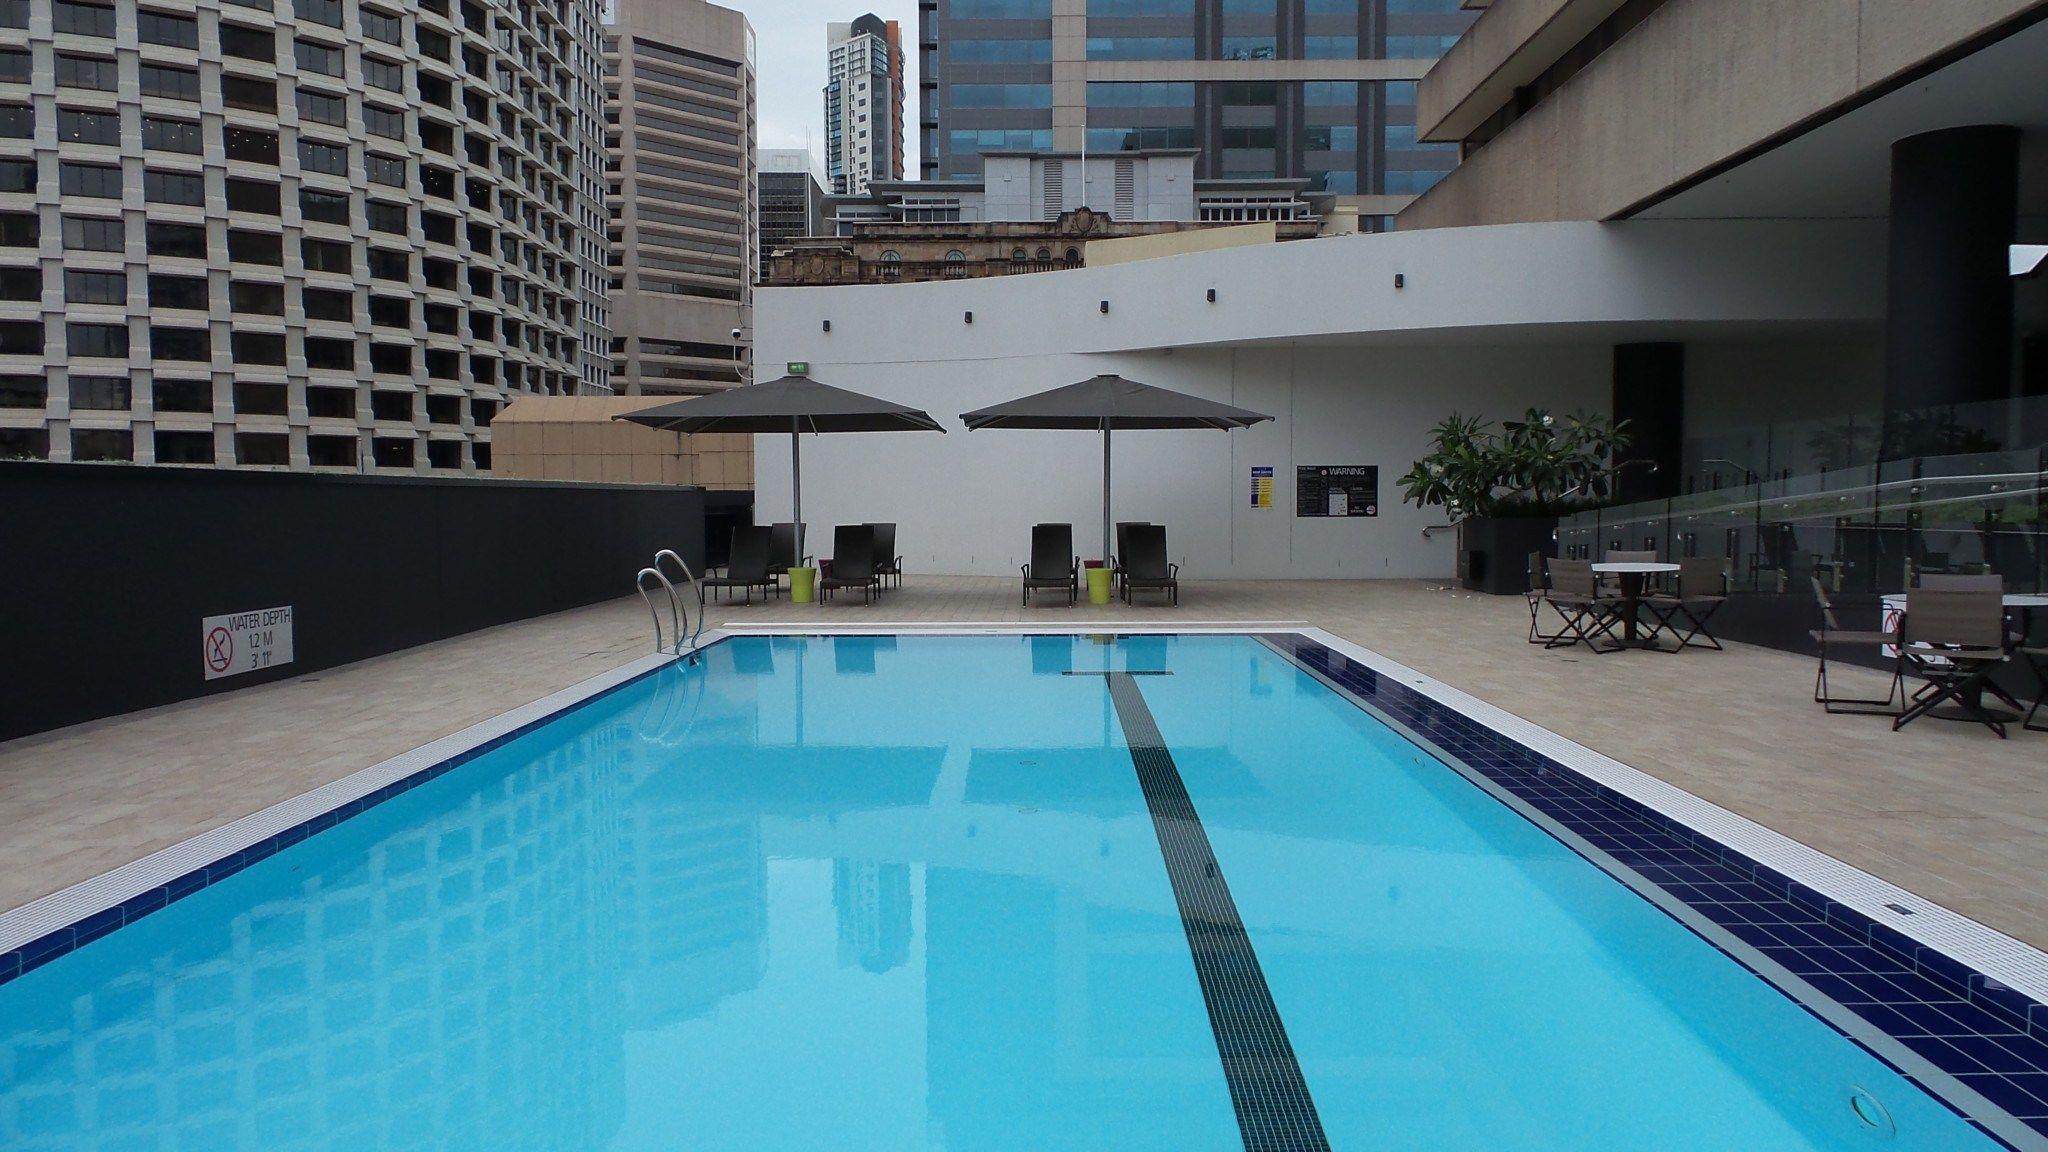 Swimming Pool Area At The Hilton Brisbane Hotel Hilton Brisbane